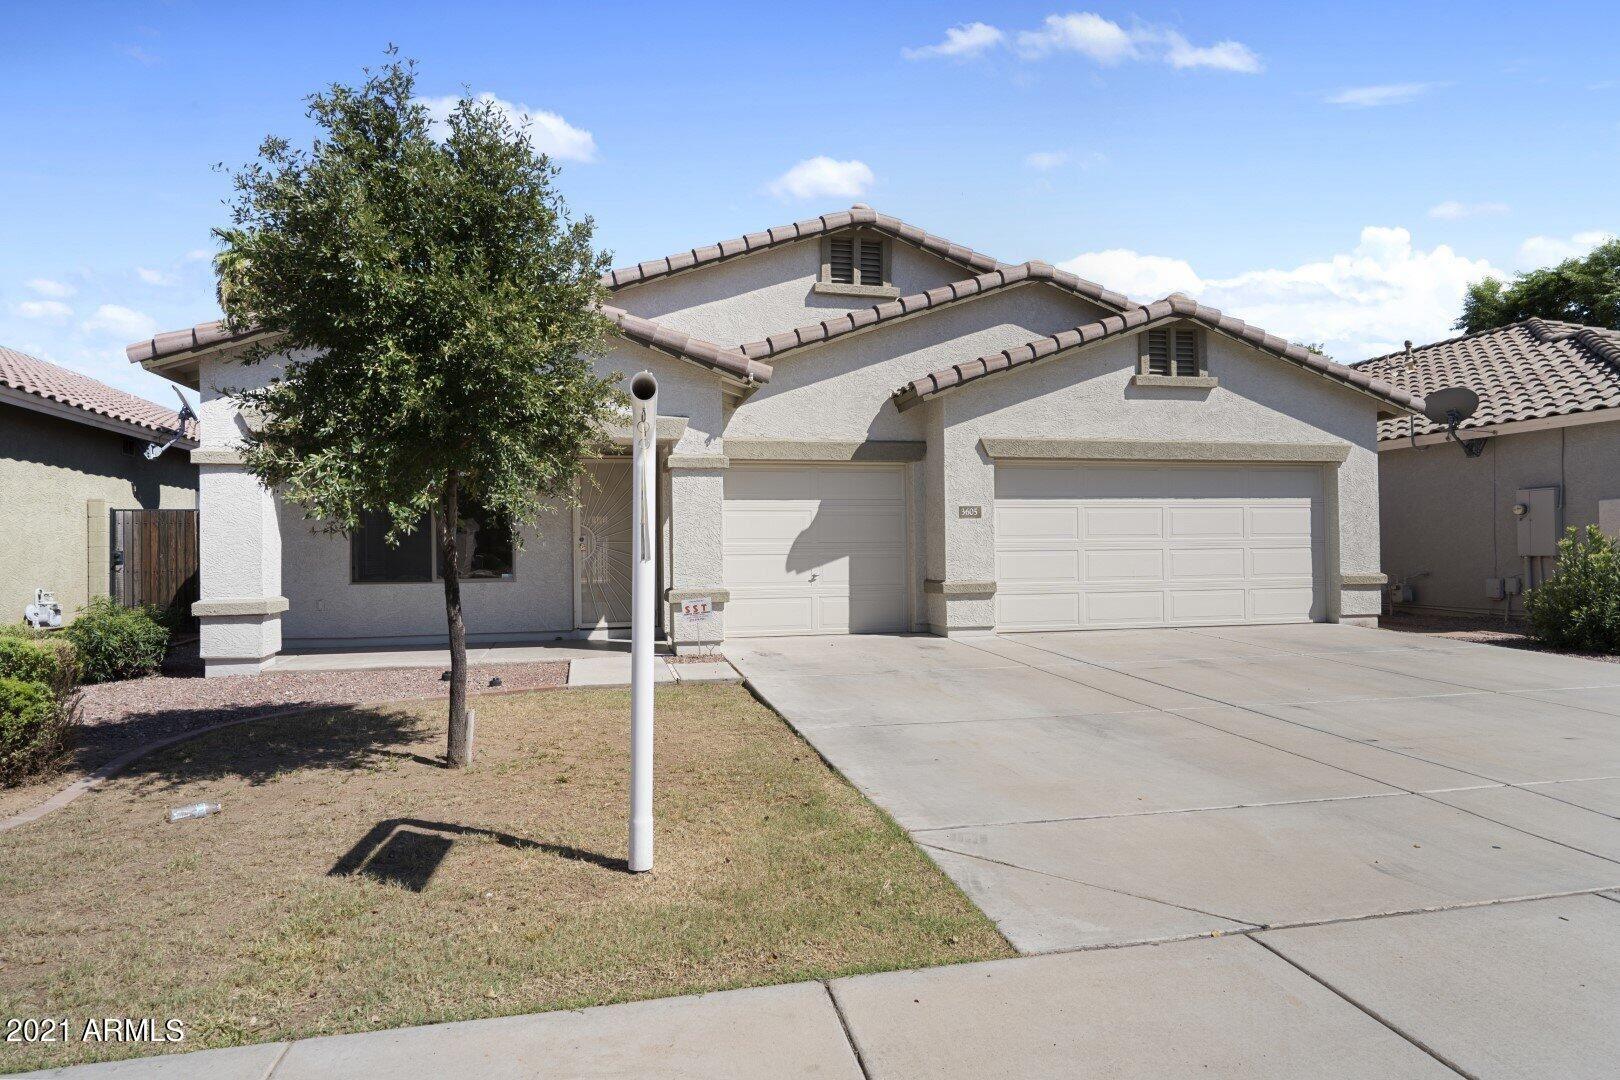 Photo of 3605 N 129TH Avenue, Avondale, AZ 85392 (MLS # 6295813)